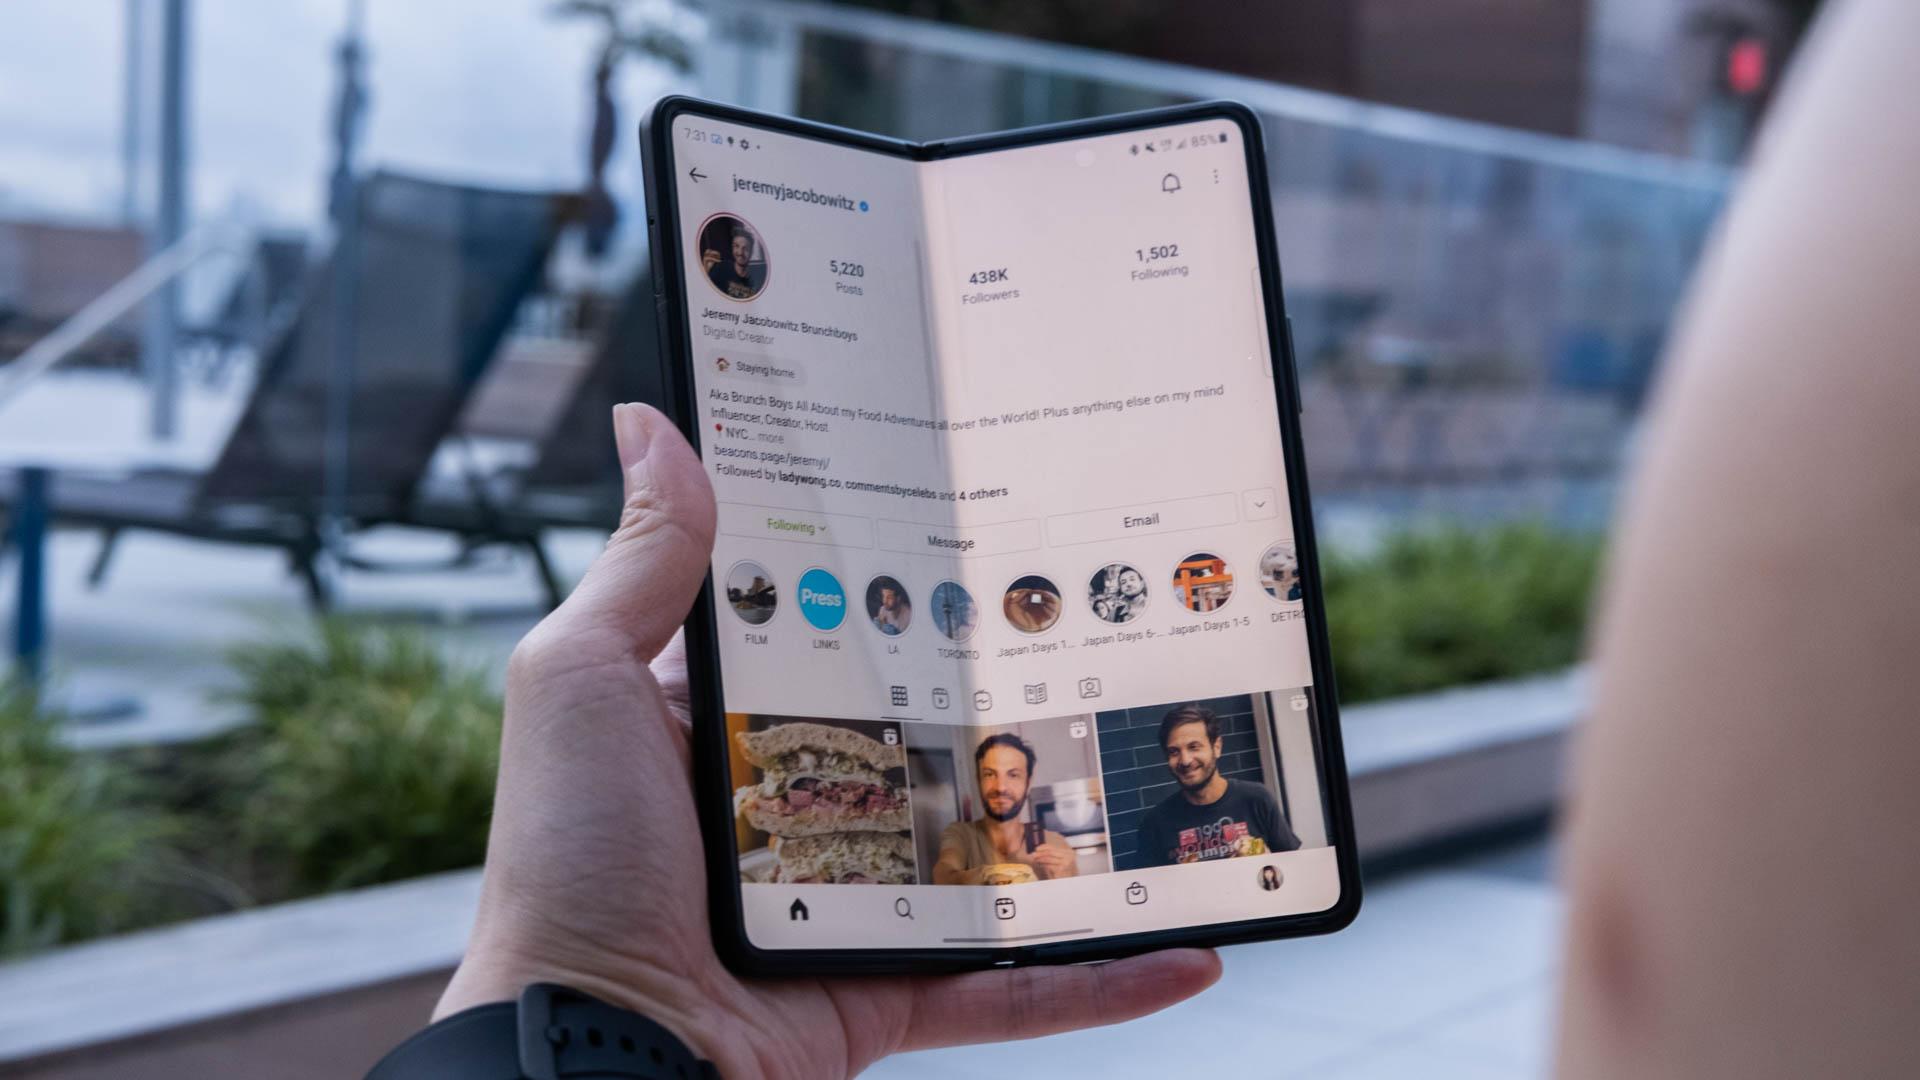 Browsing Instagram on the Samsung Galaxy Z Fold 3